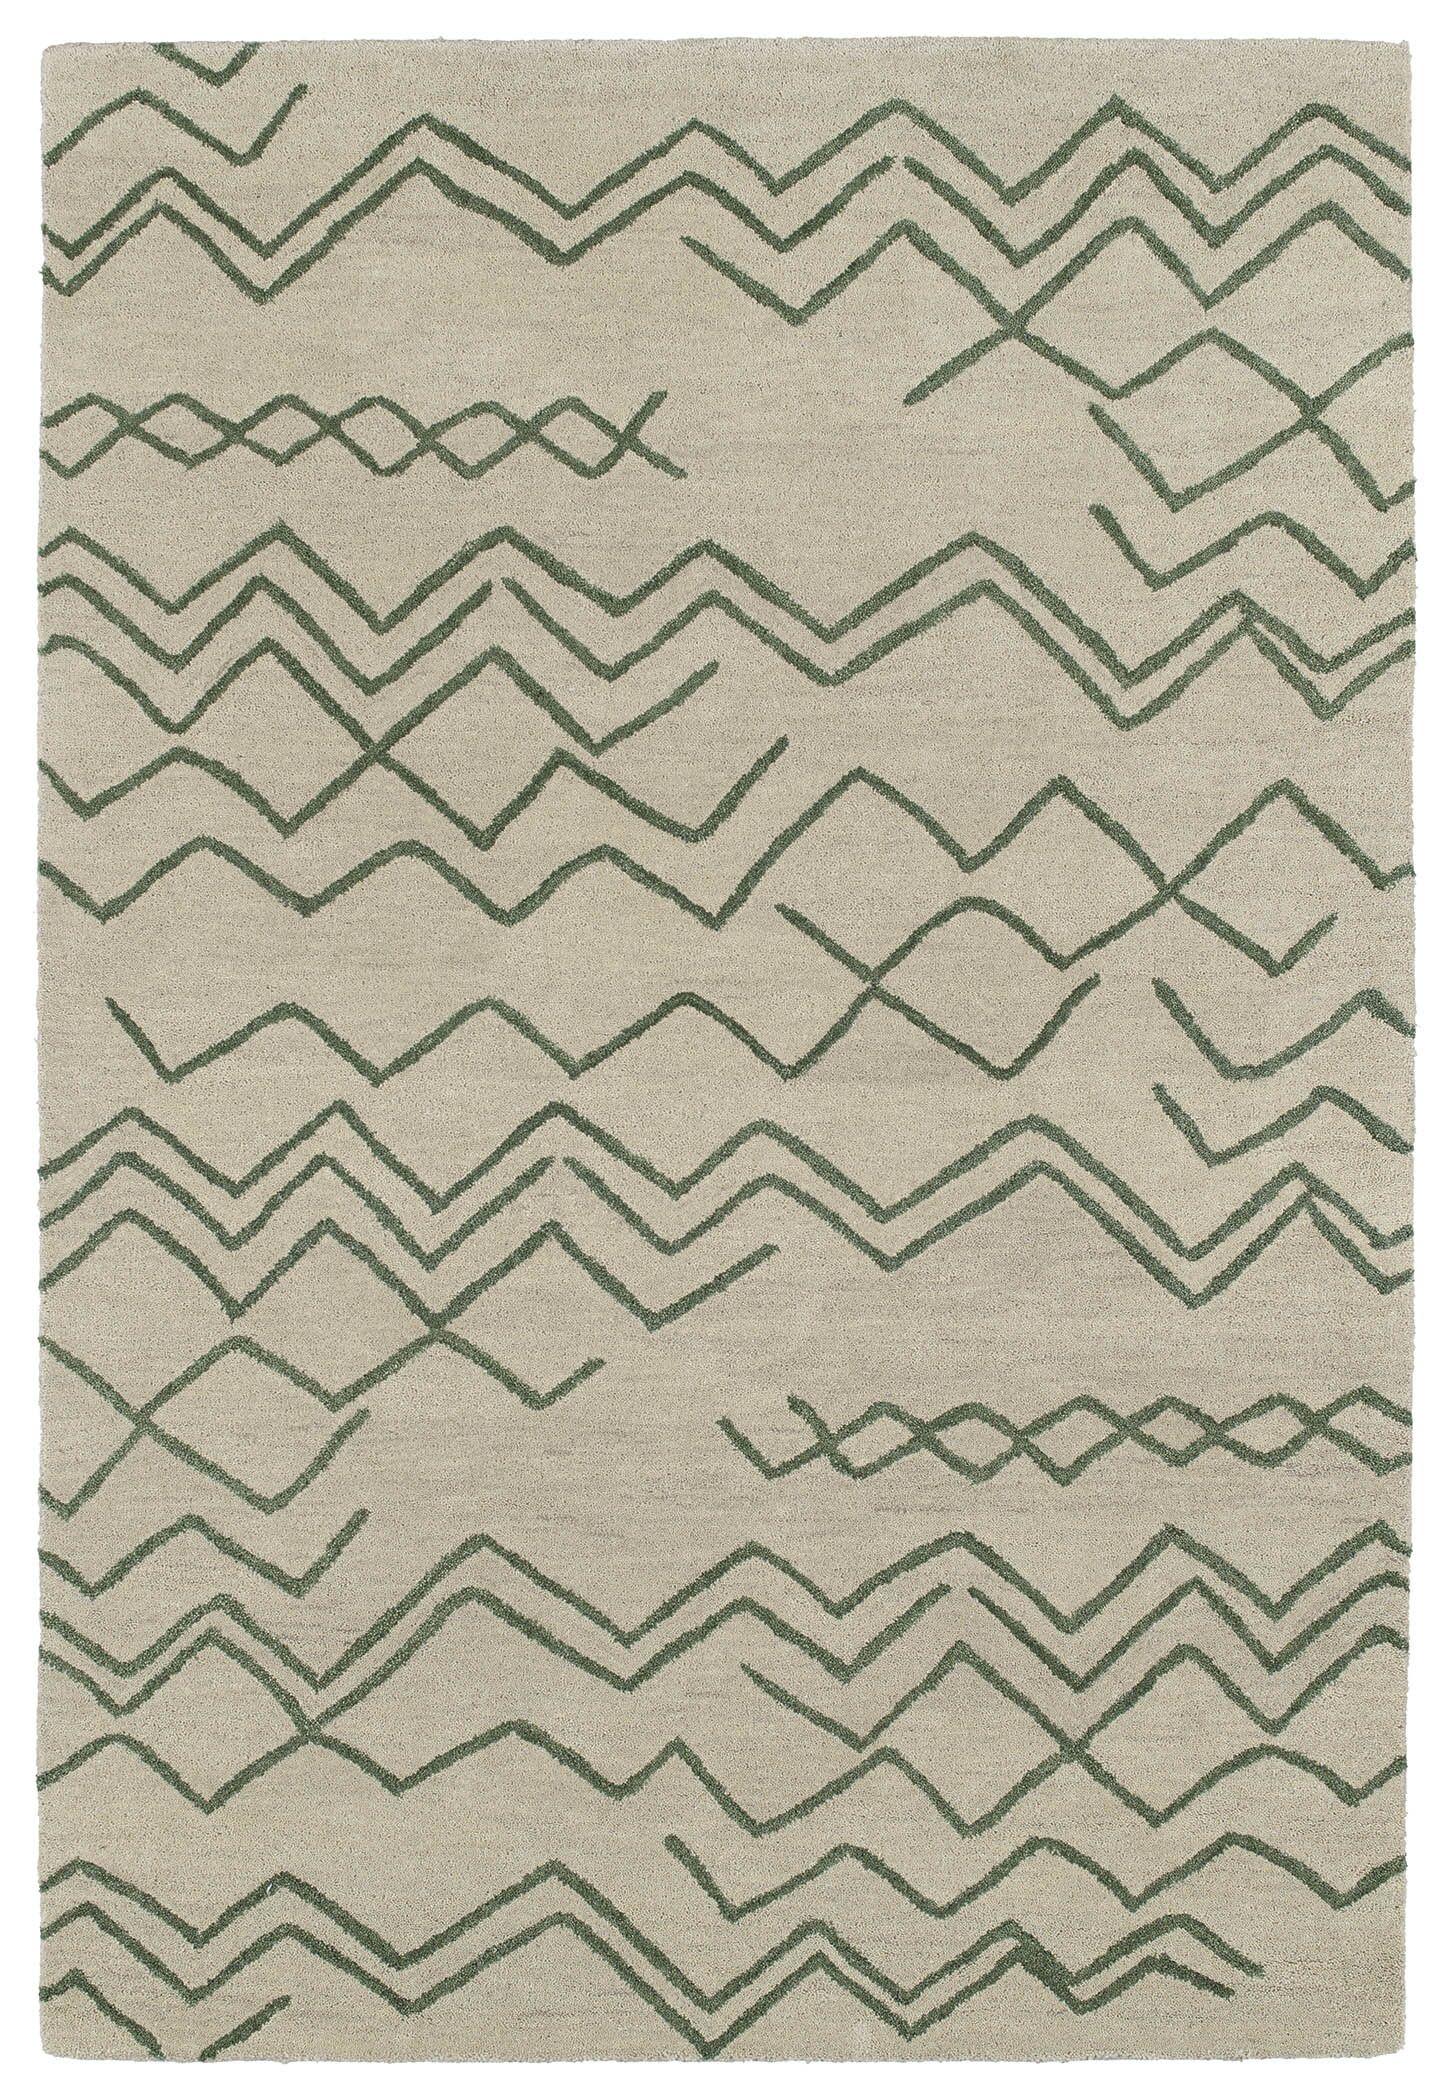 Zack Cream & Green Geometric Area Rug Rug Size: Rectangle 4' x 6'